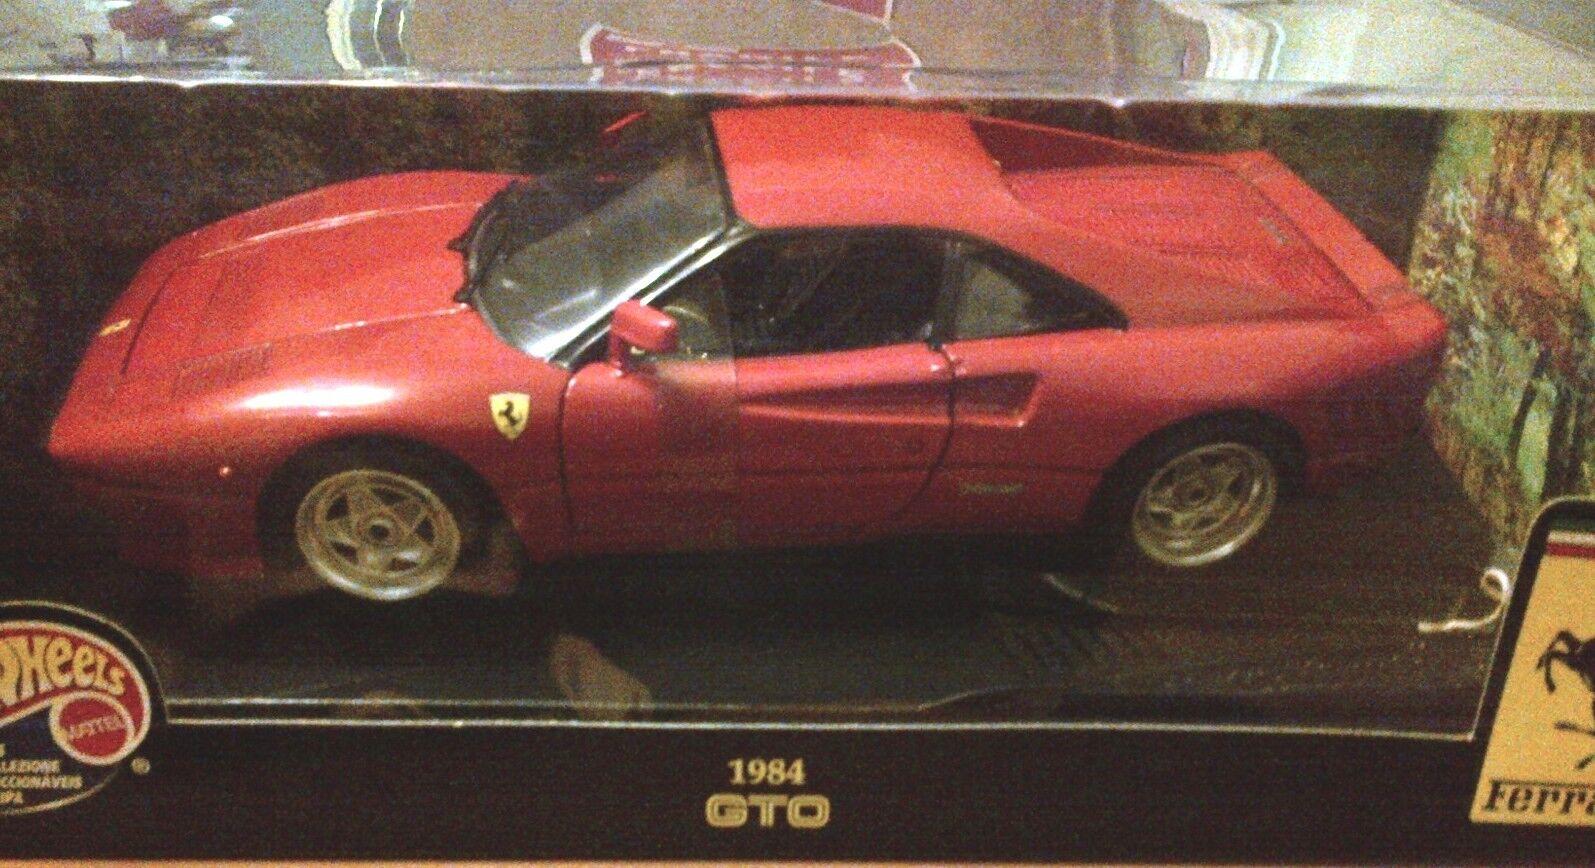 Ferrari 288 GTO rouge hot wheels très rare interrompu Brand New in Near Comme neuf BOX